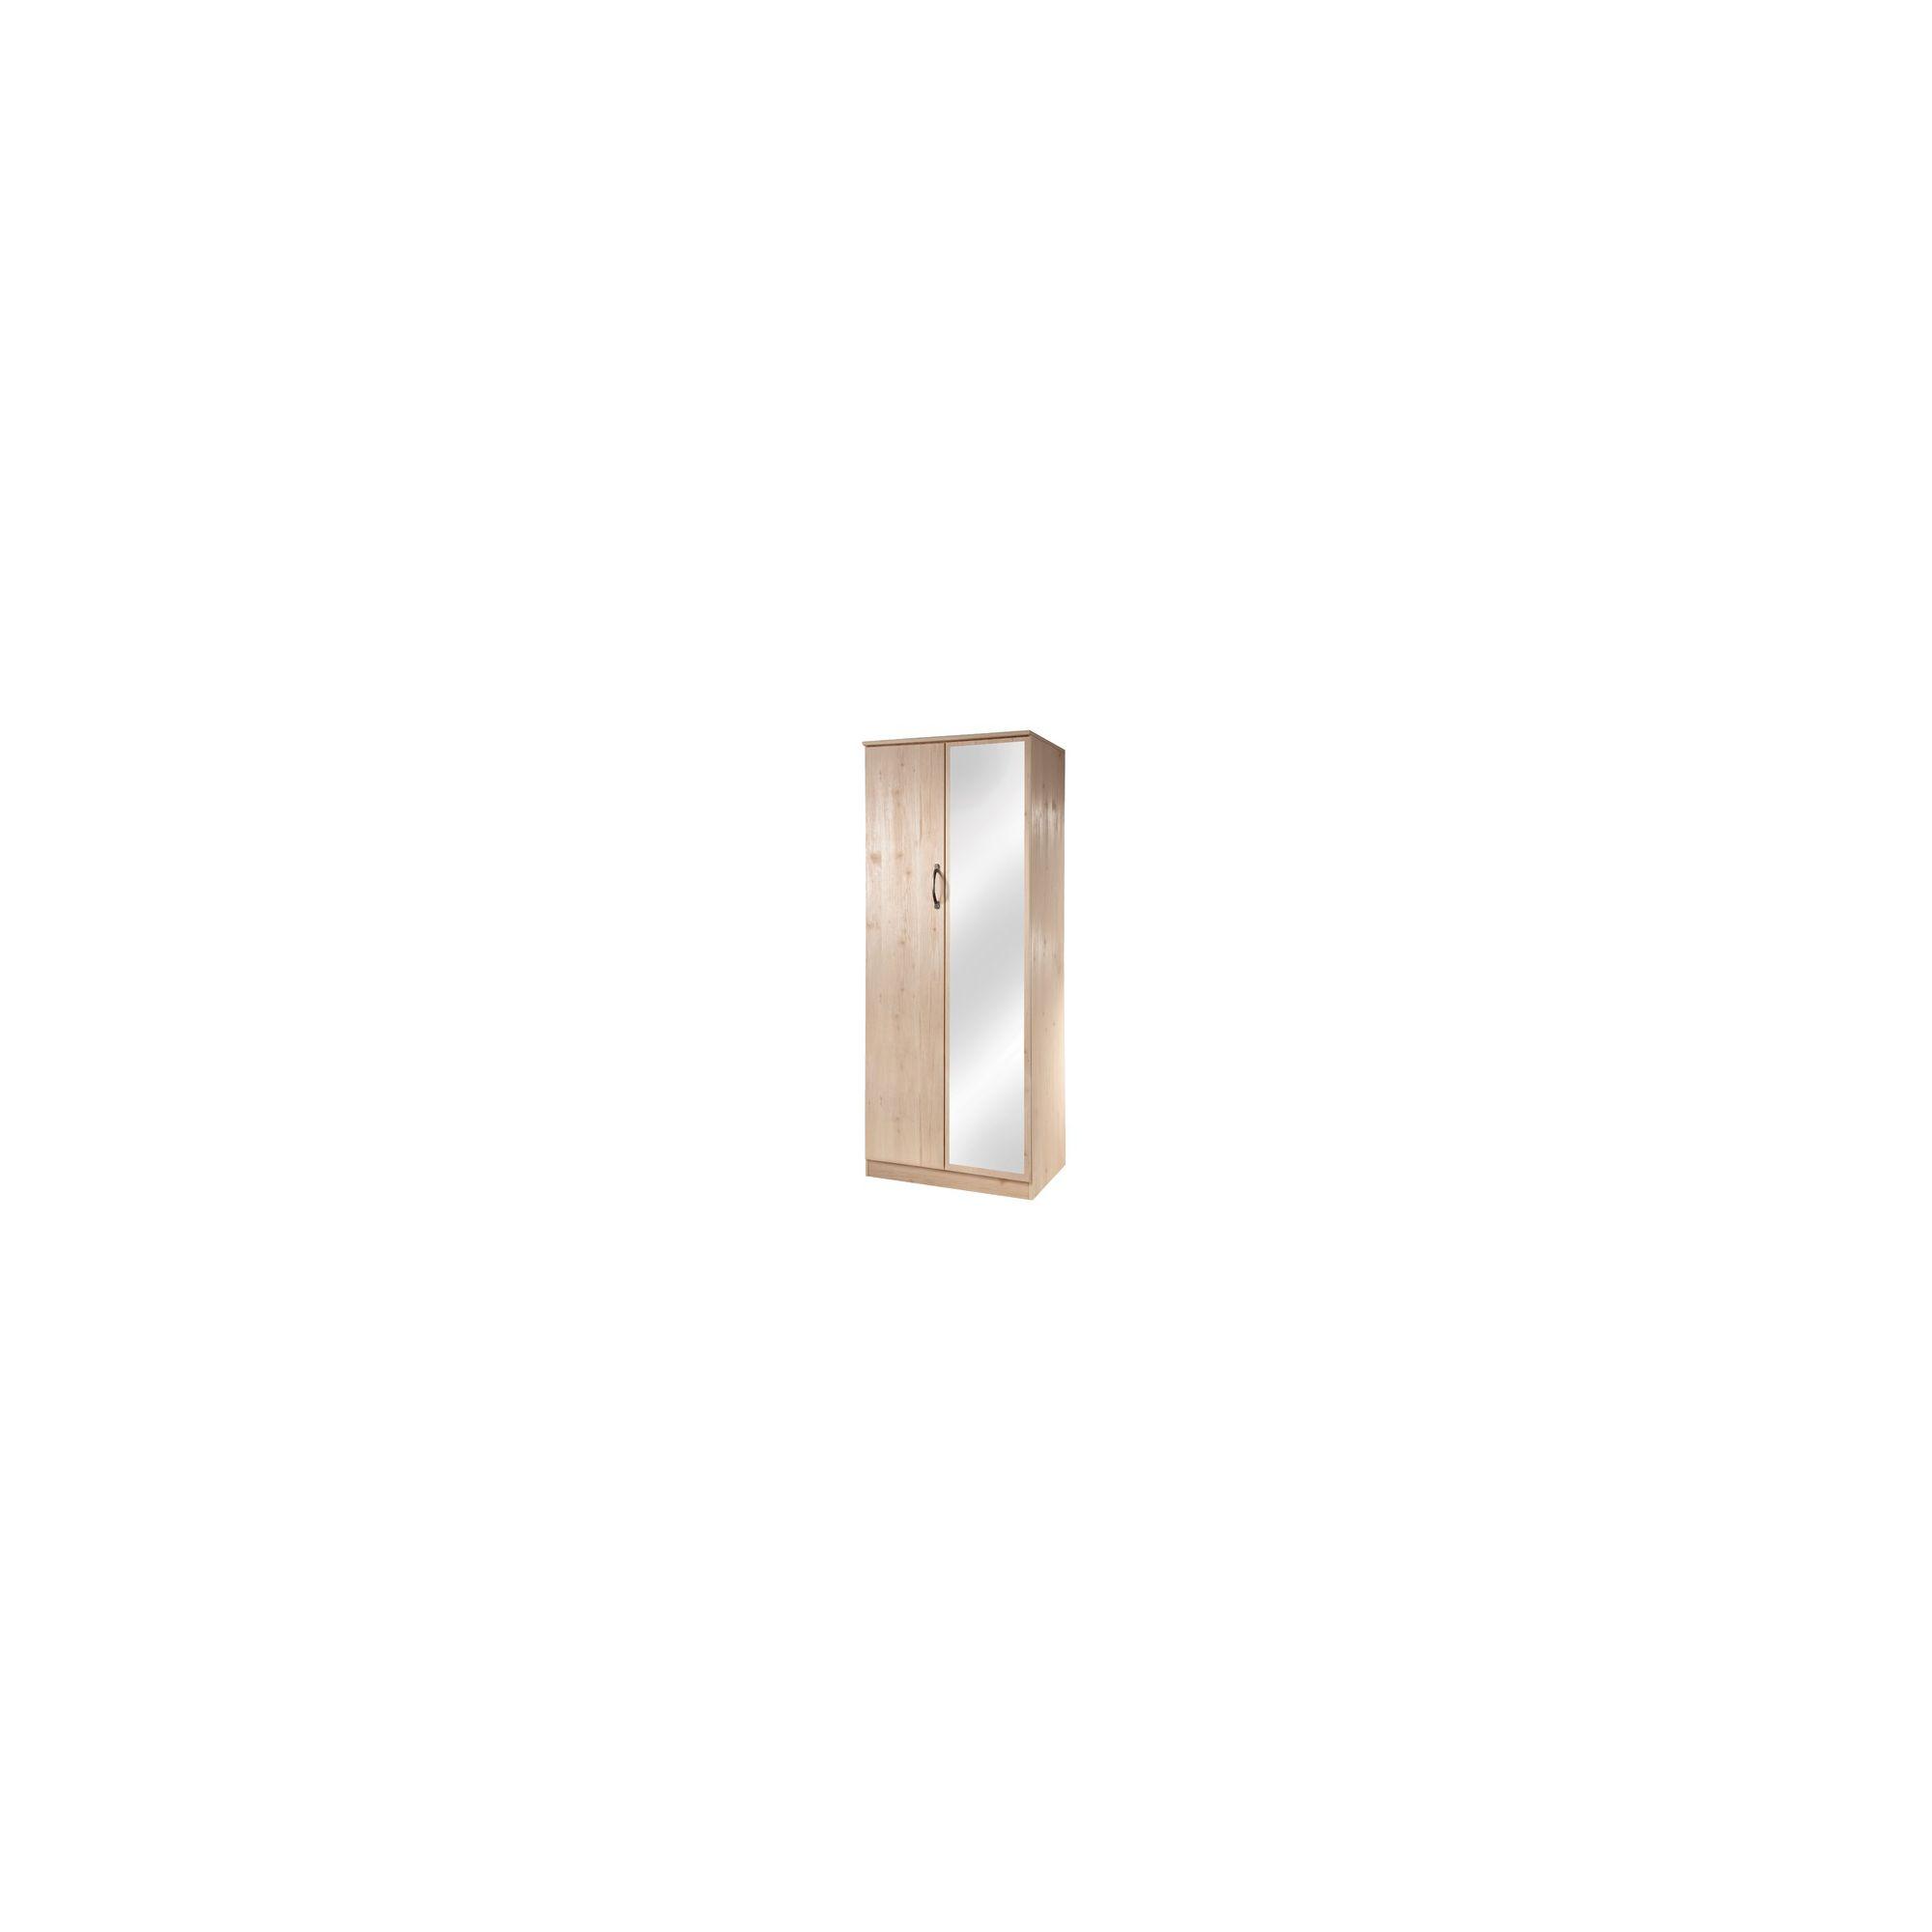 Welcome Furniture Florida Mirror Wardrobe - 182.5cm H at Tesco Direct